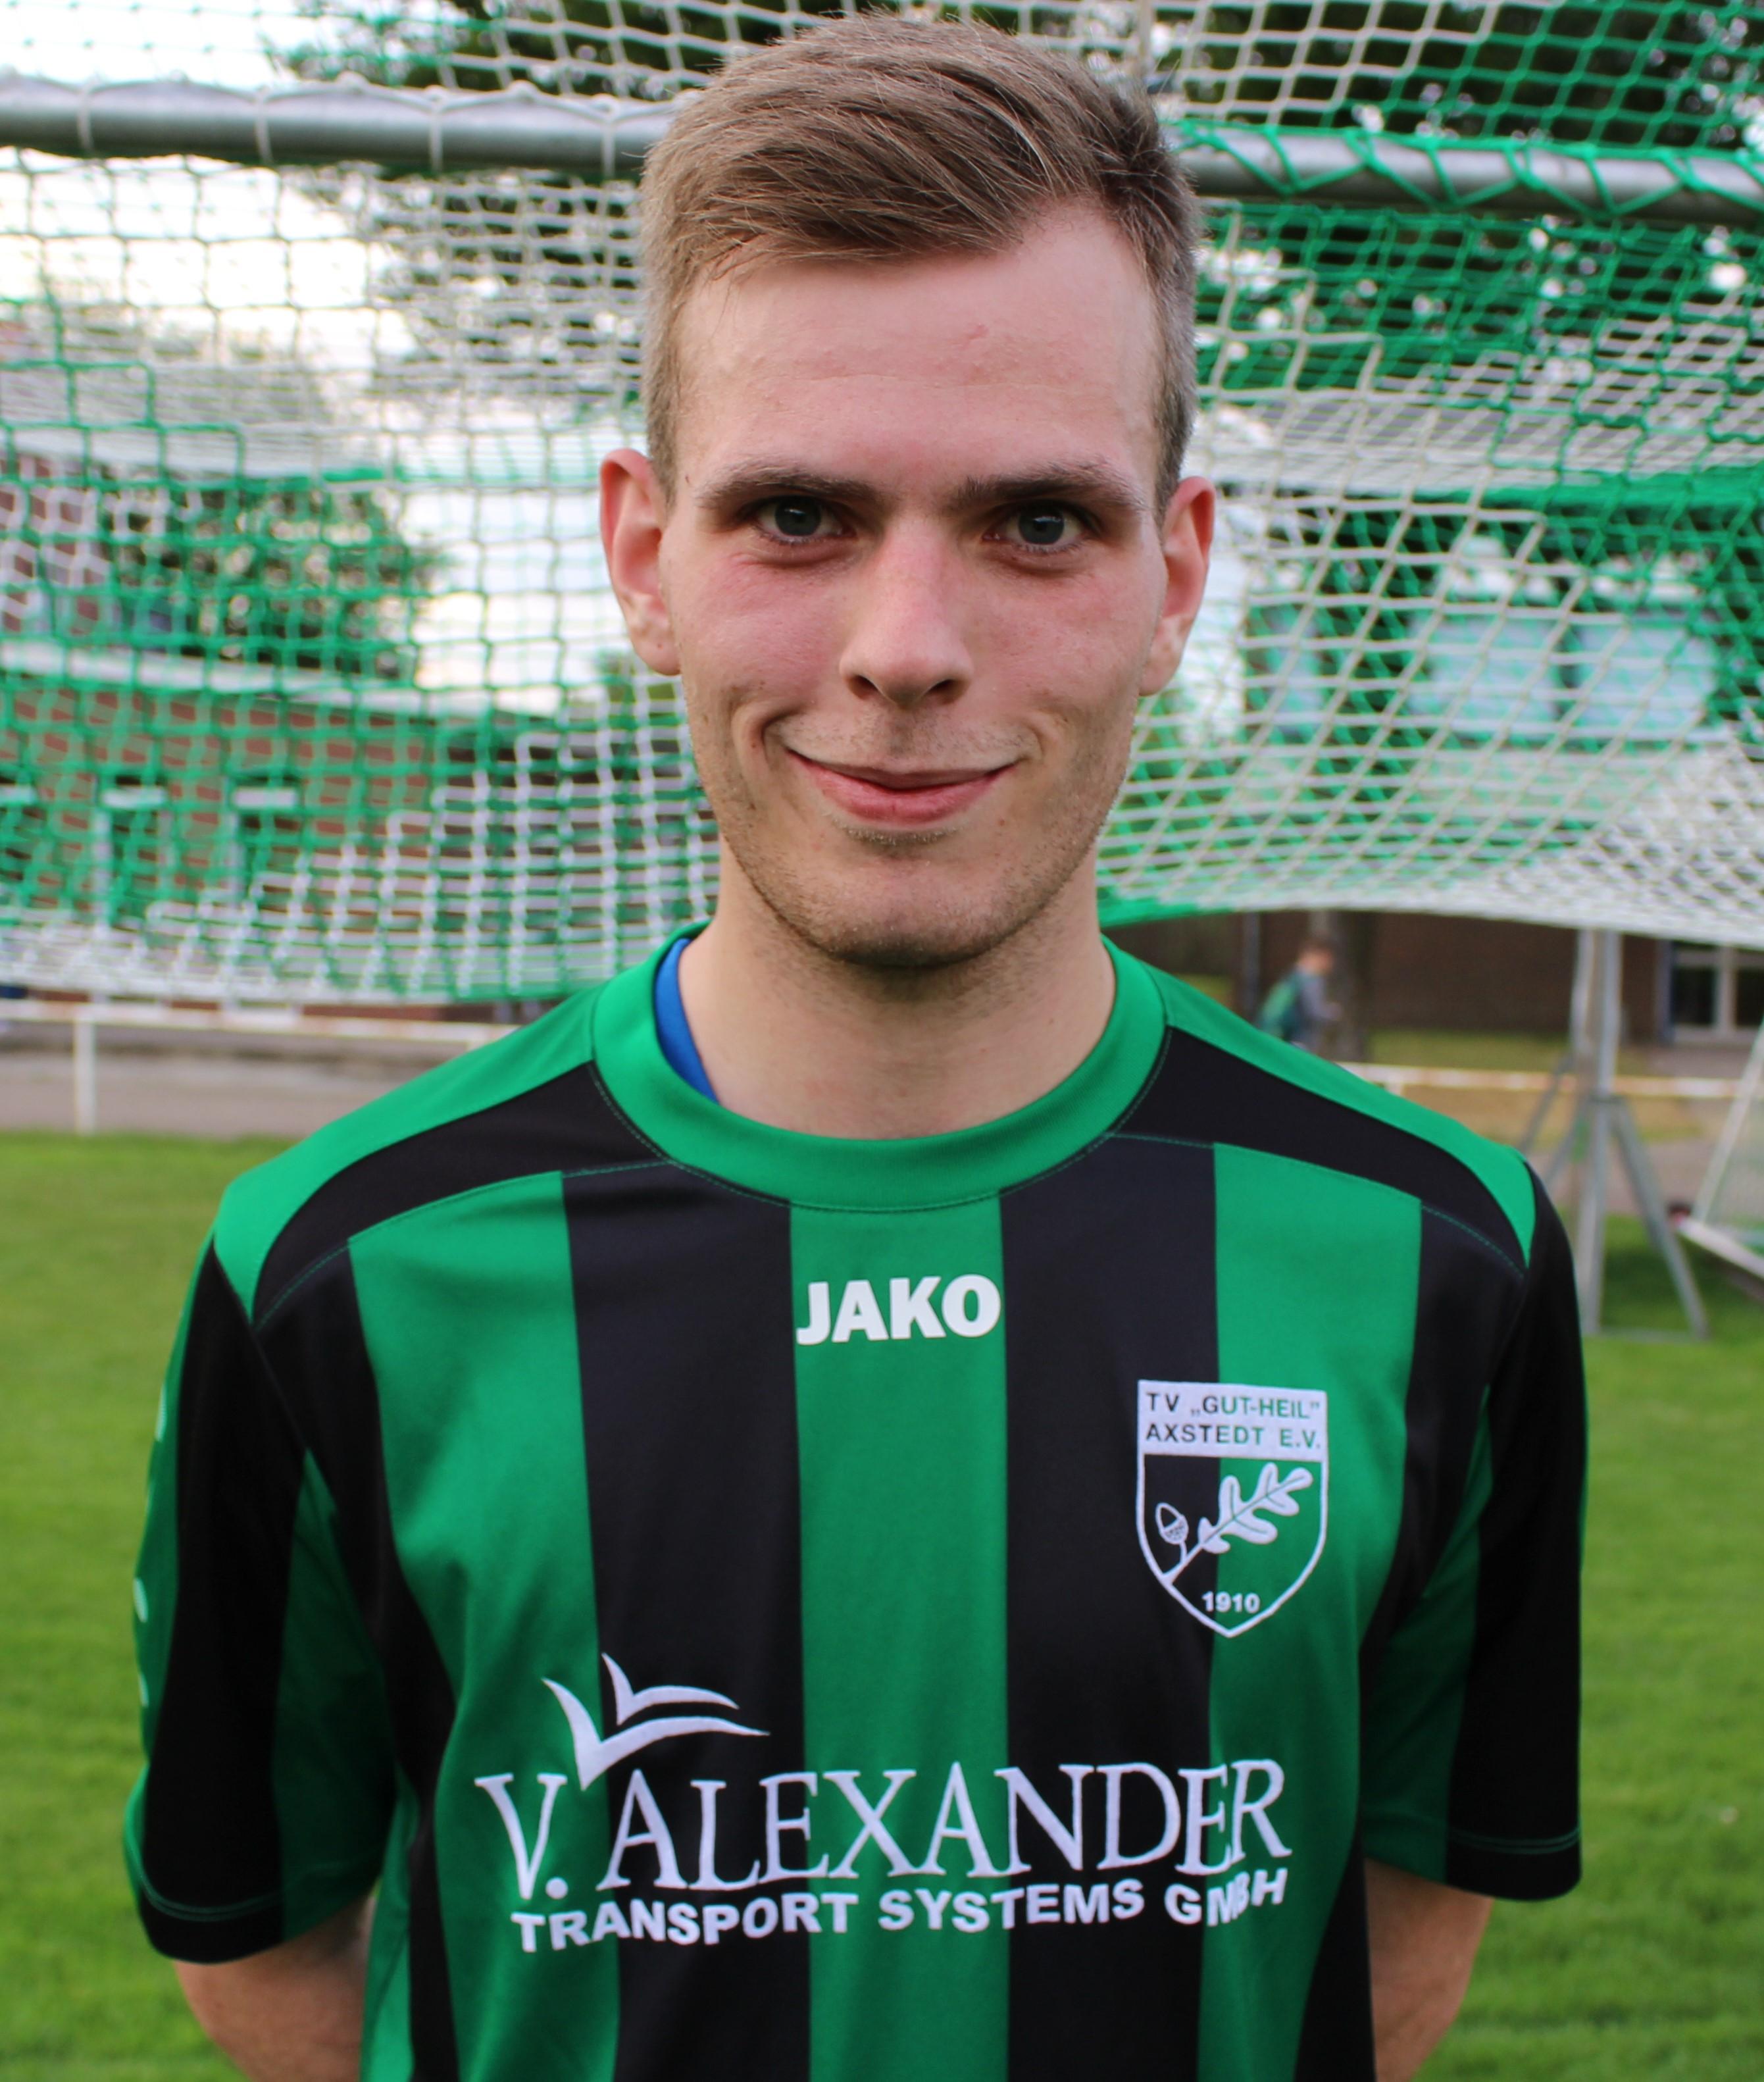 Foto / Portrait Spieler Nils Wendelken